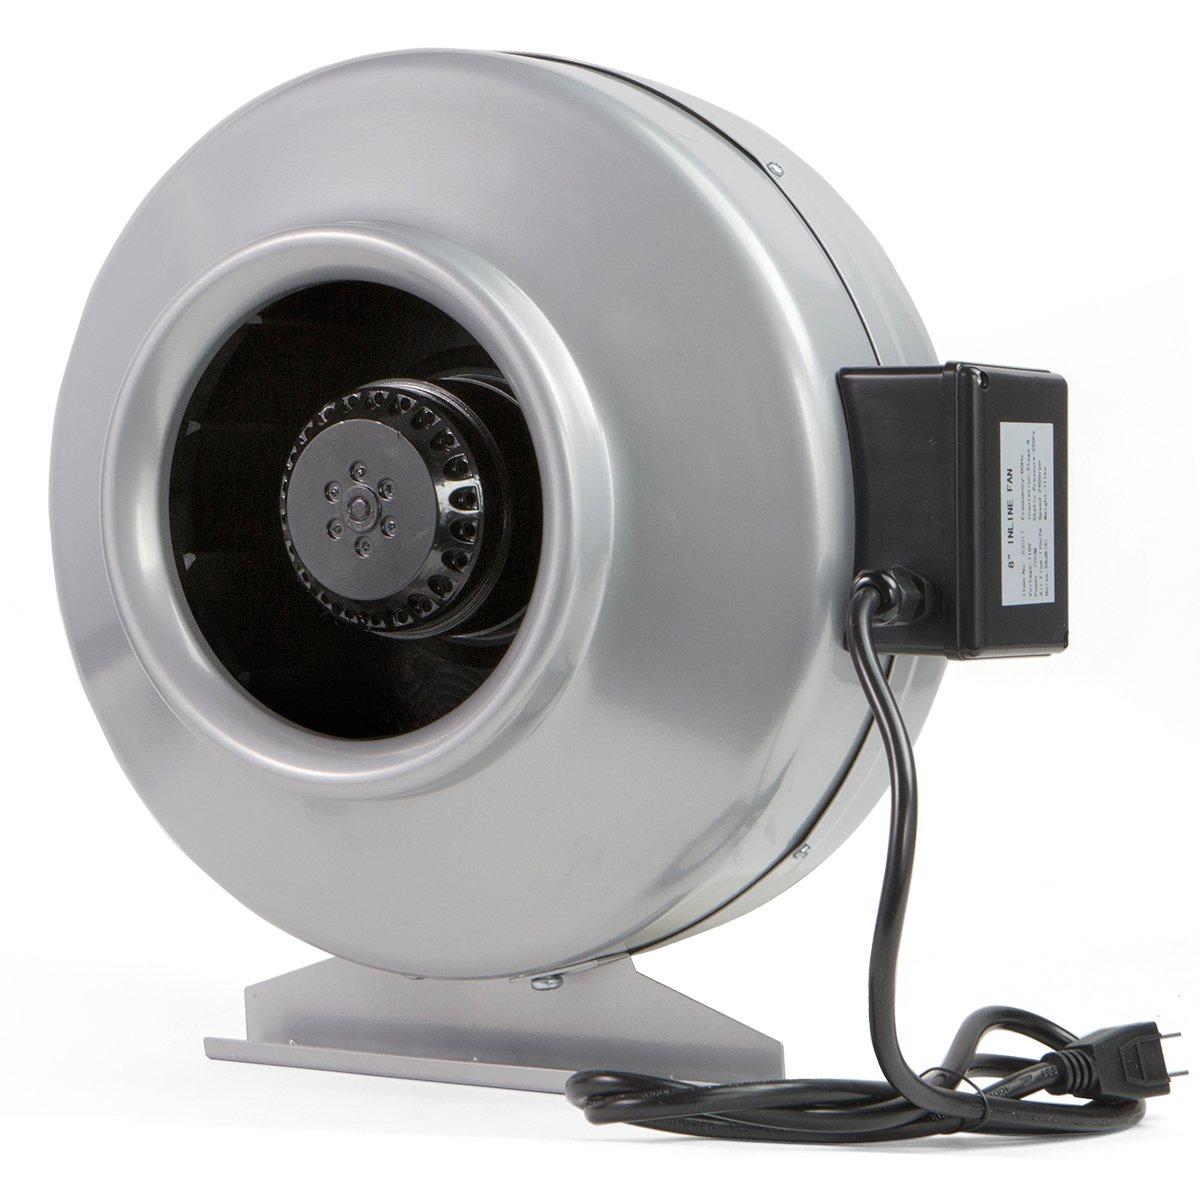 XtremepowerUS Inline Duct 8'' 770 CFM Fan, Sliver